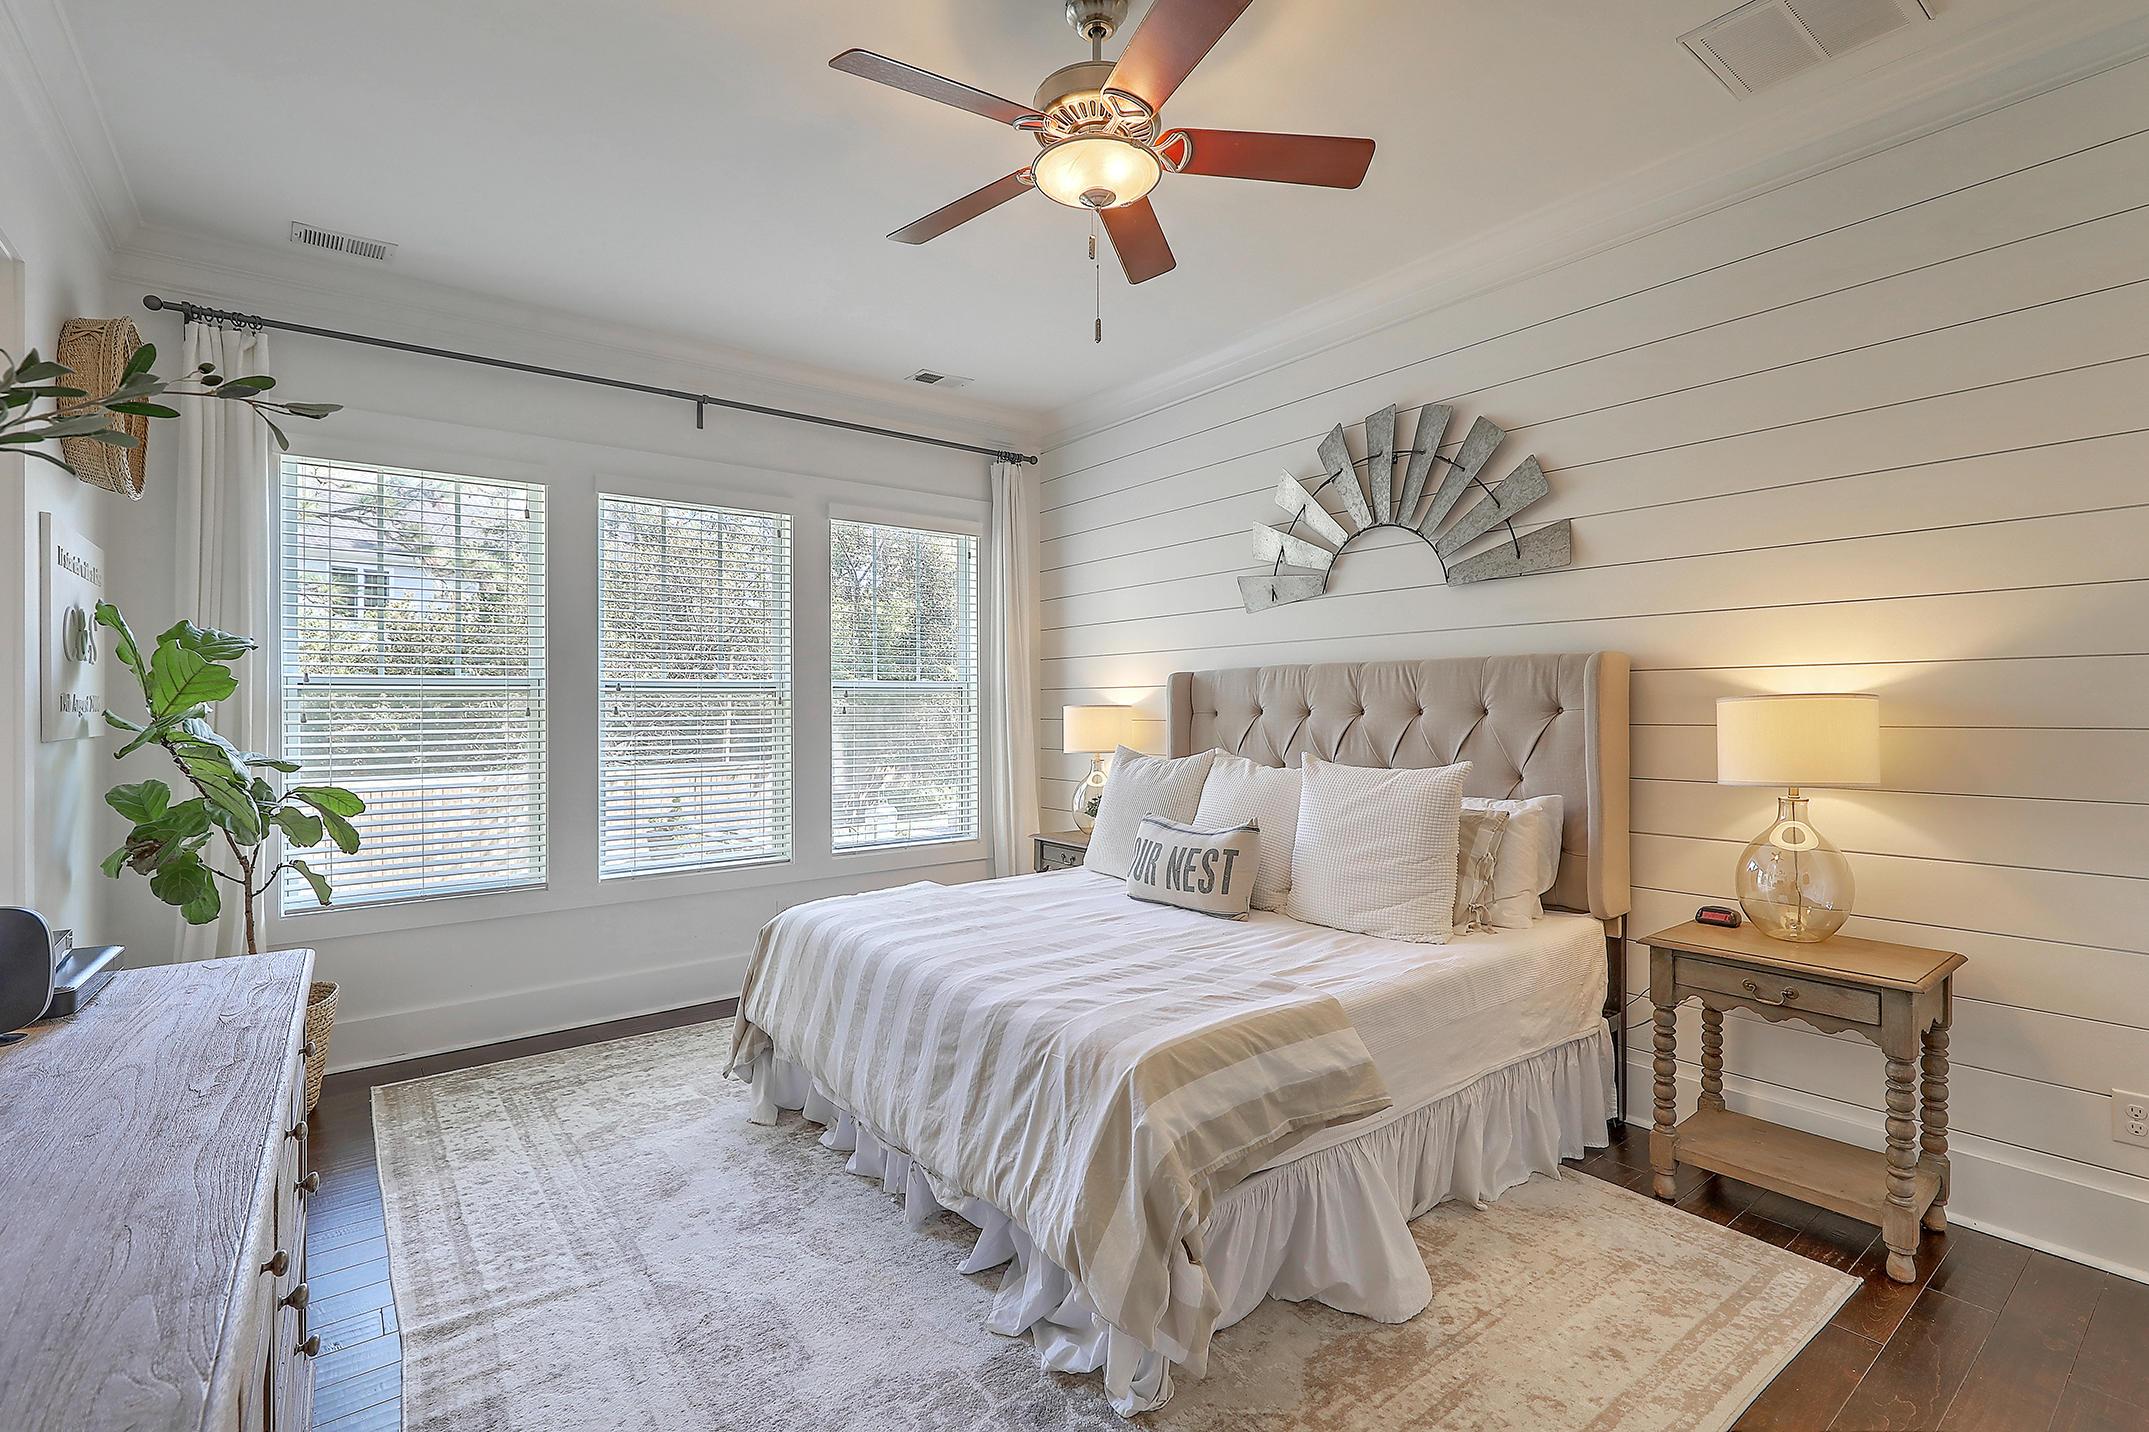 Stiles Point Plantation Homes For Sale - 750 Old Plantation, Charleston, SC - 16